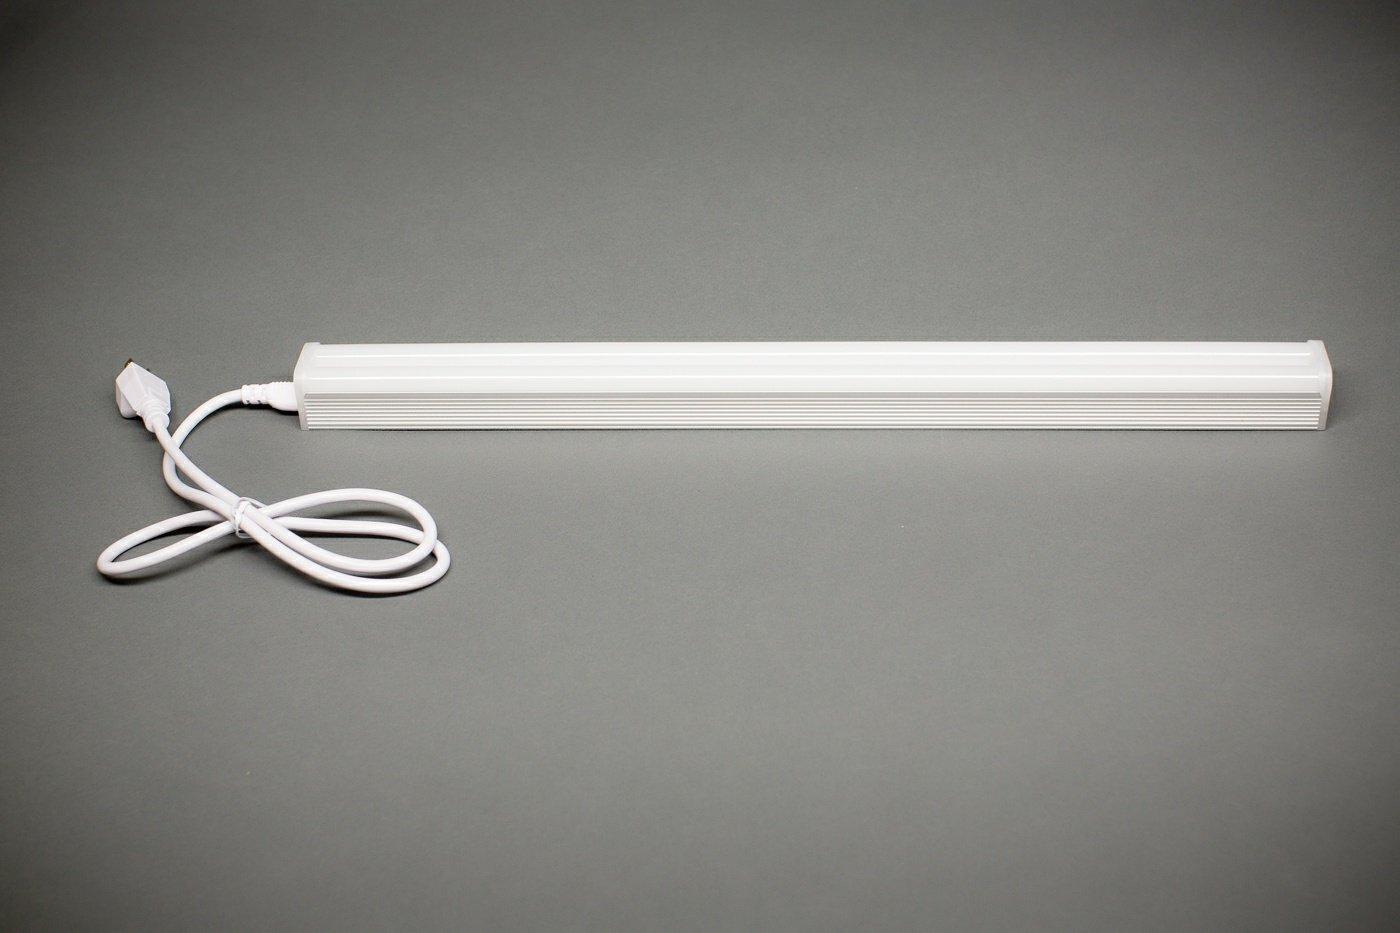 MyStudio® LED22 22-inch Ultra Bright 5000K LED Light Bar